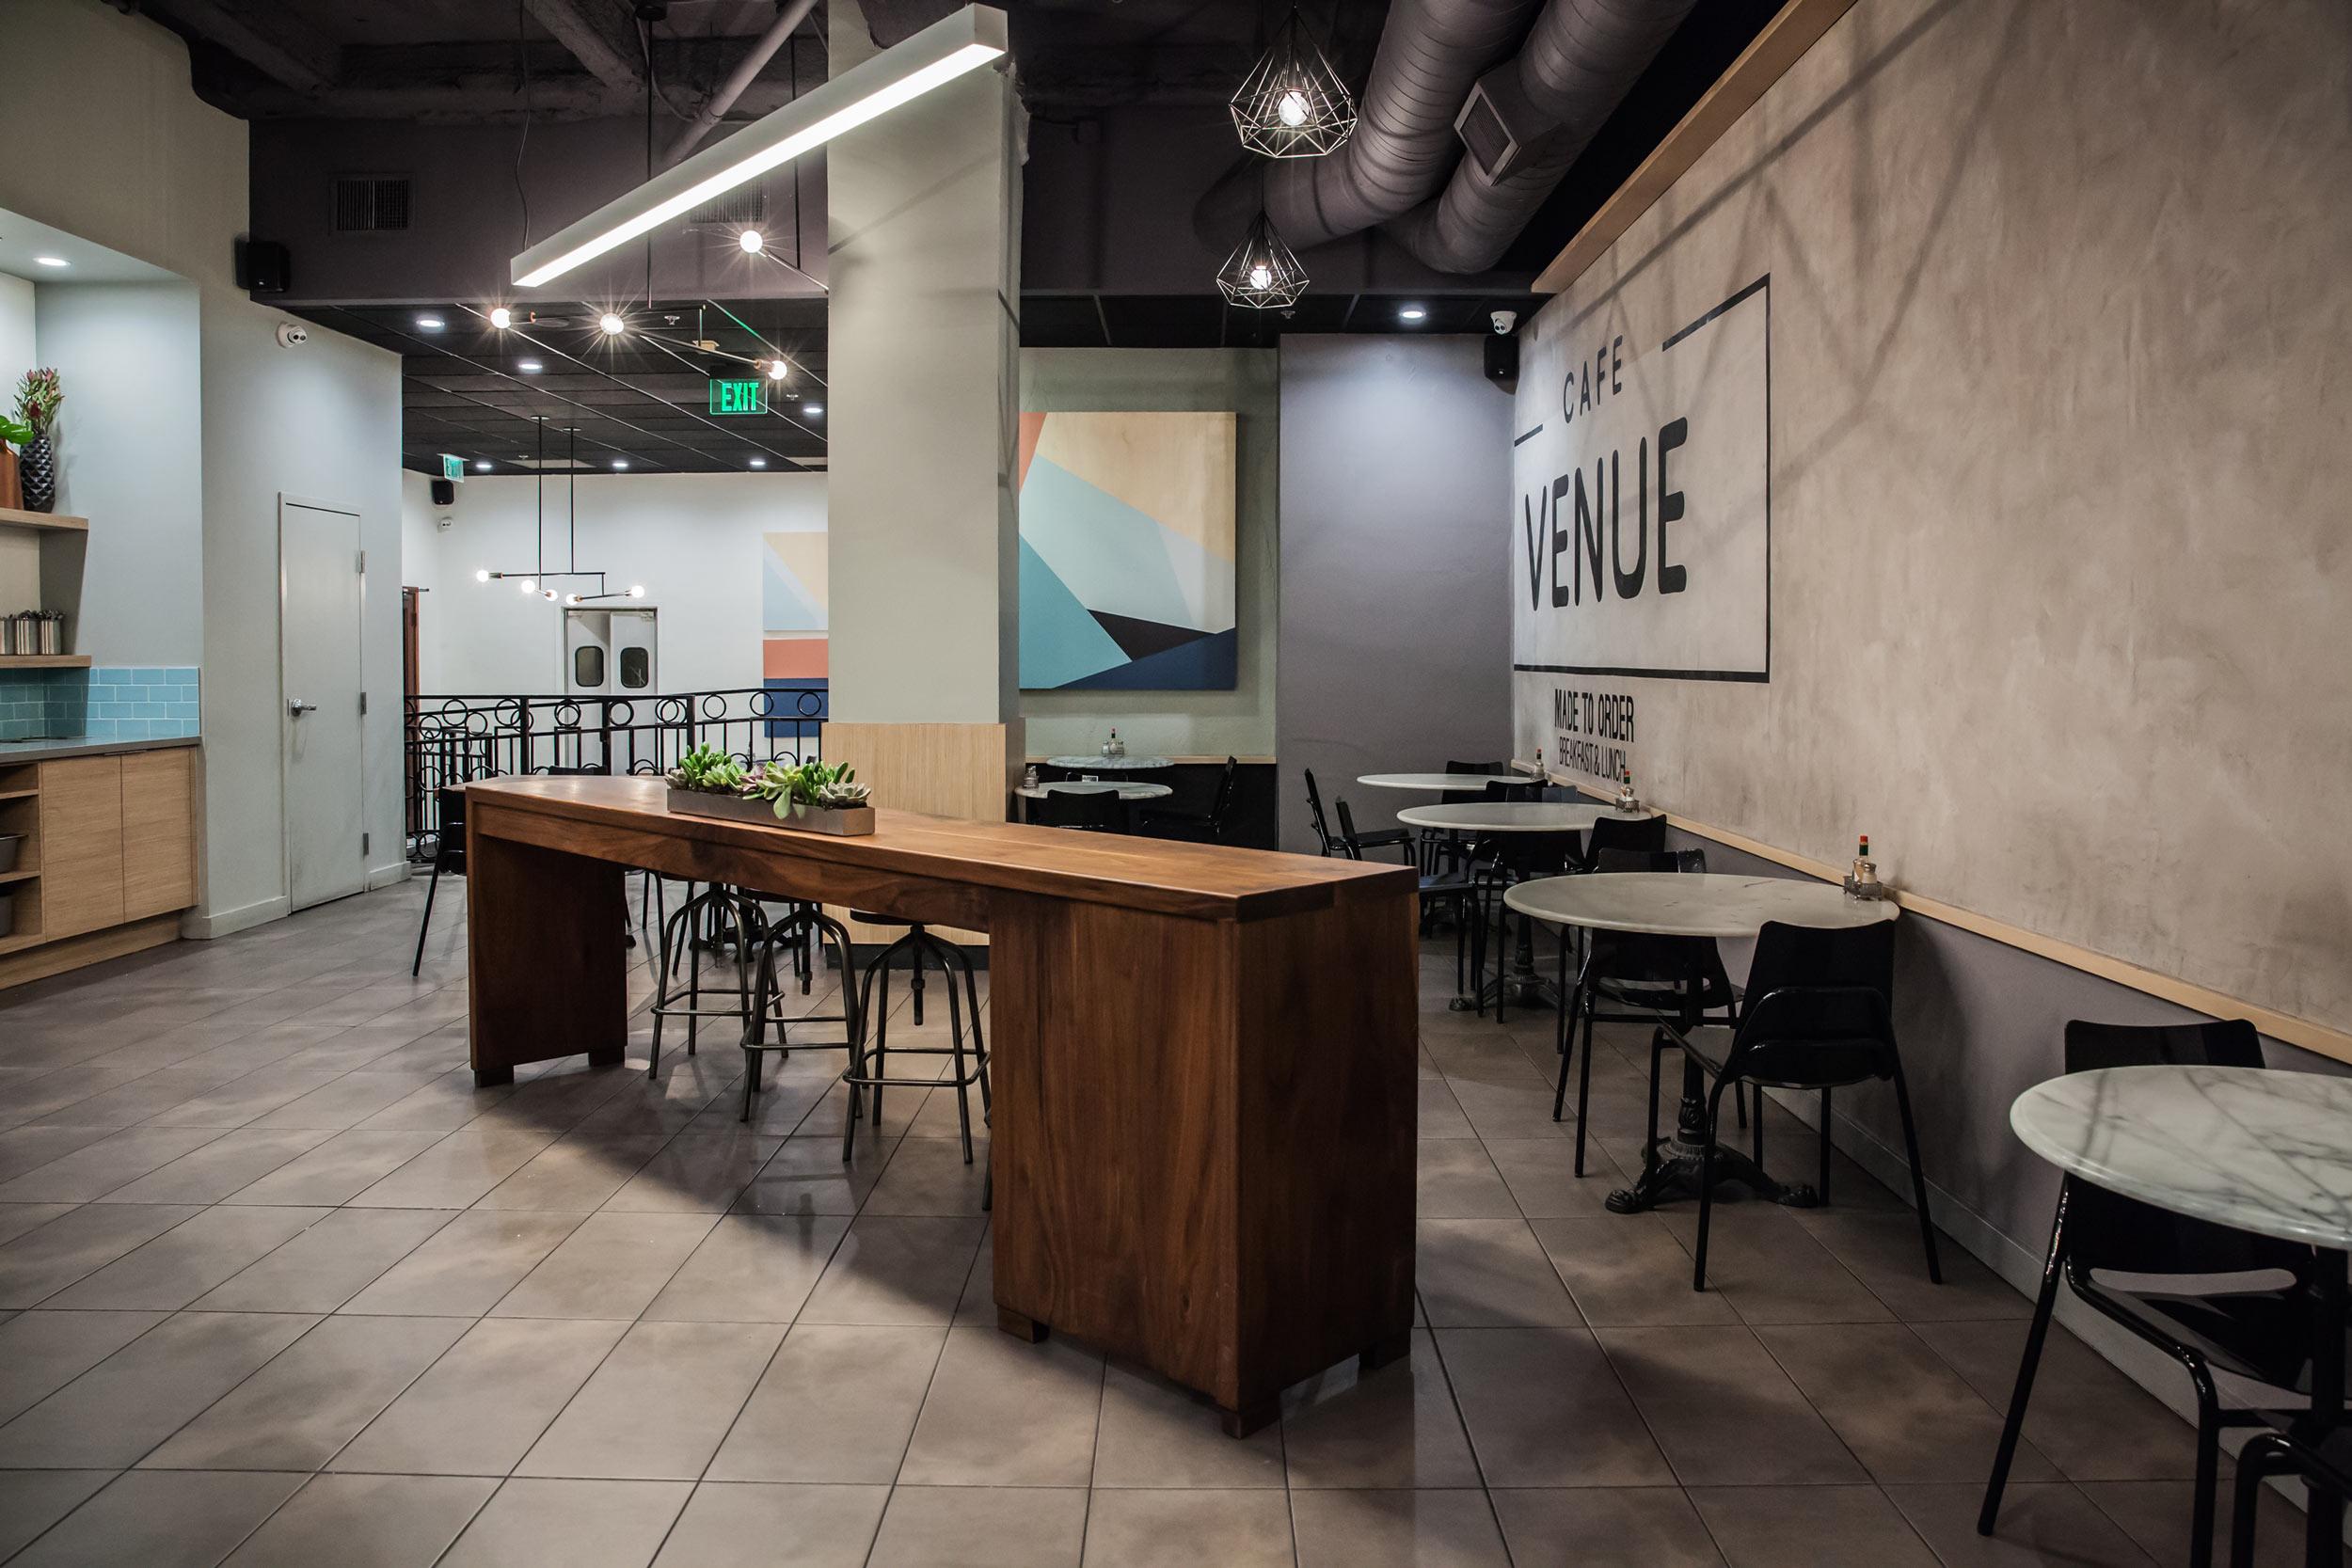 Photo-of-Cafe-Venue-Interior.jpg